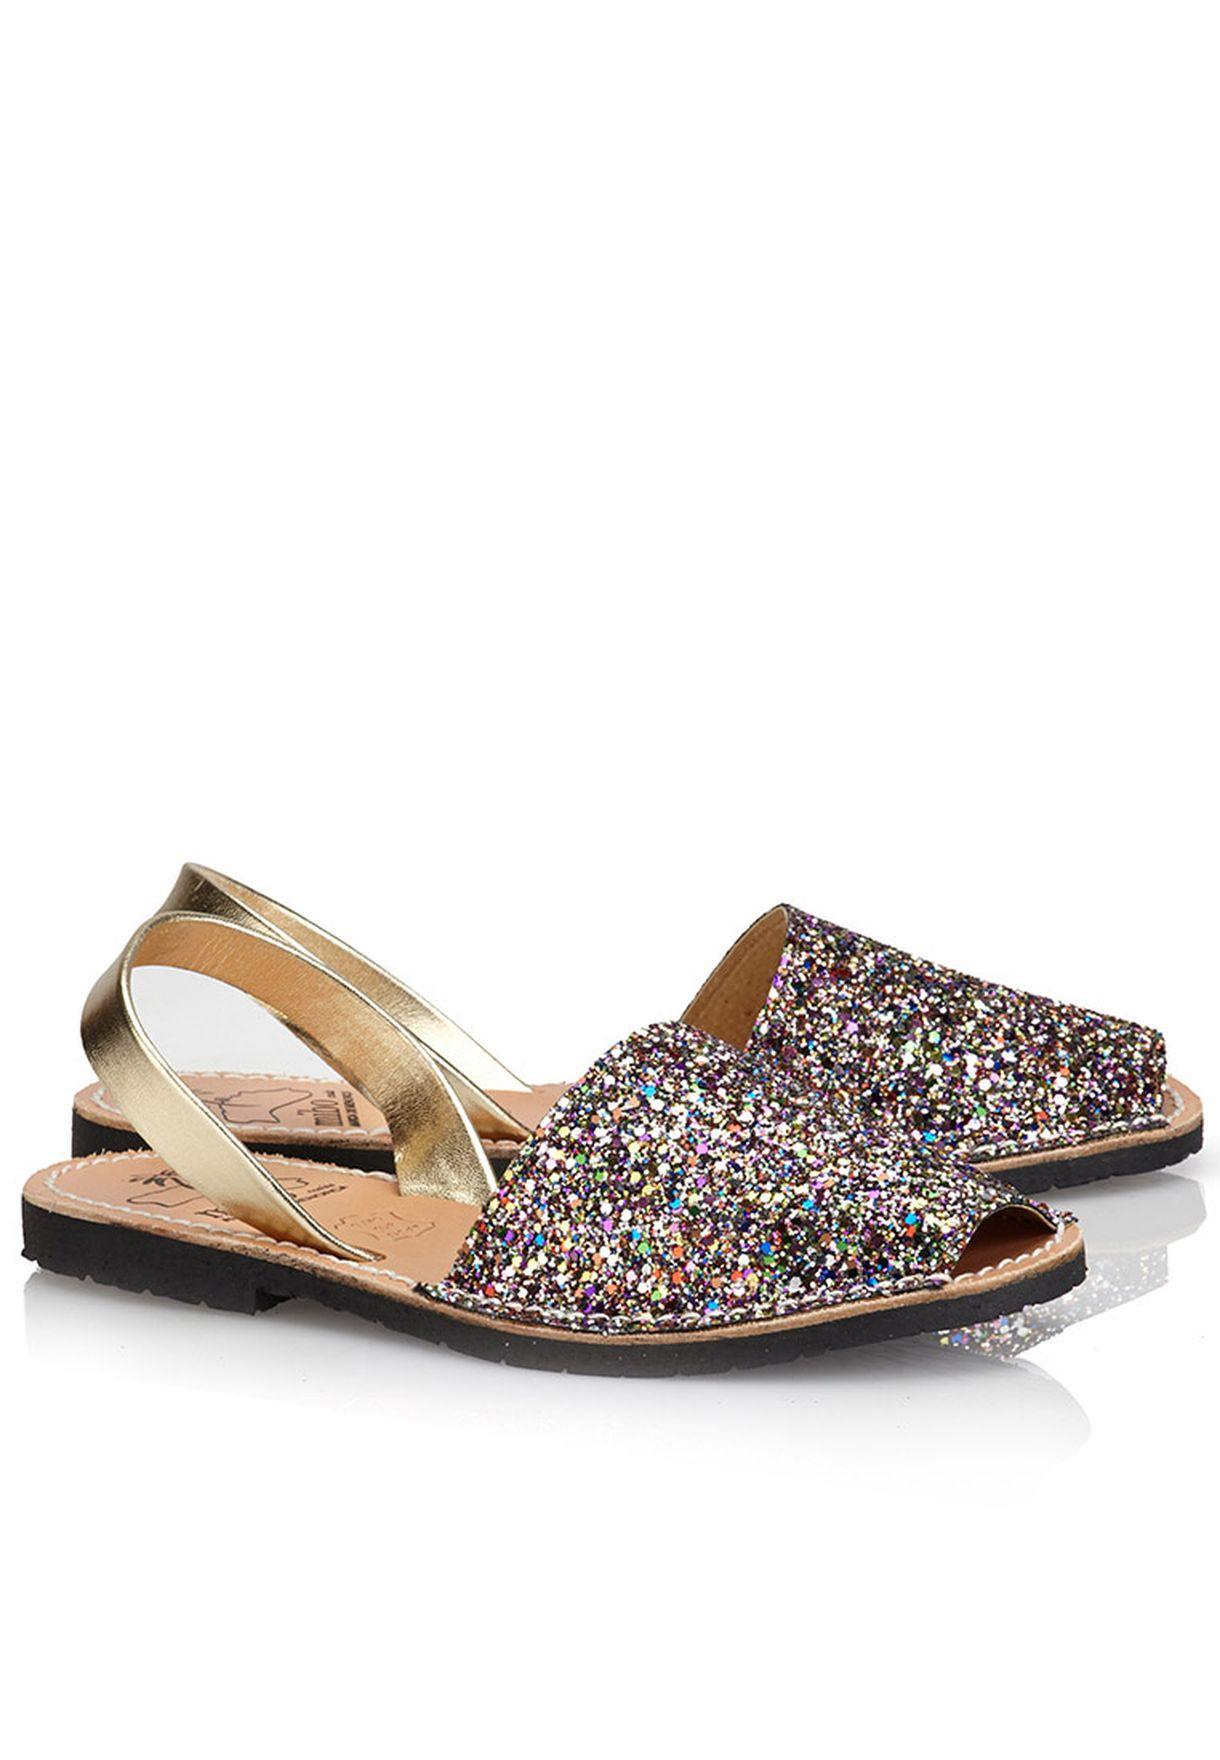 4b48abbcd Shop Mibo multicolor Glitter Sling Back Sandals for Women in UAE ...